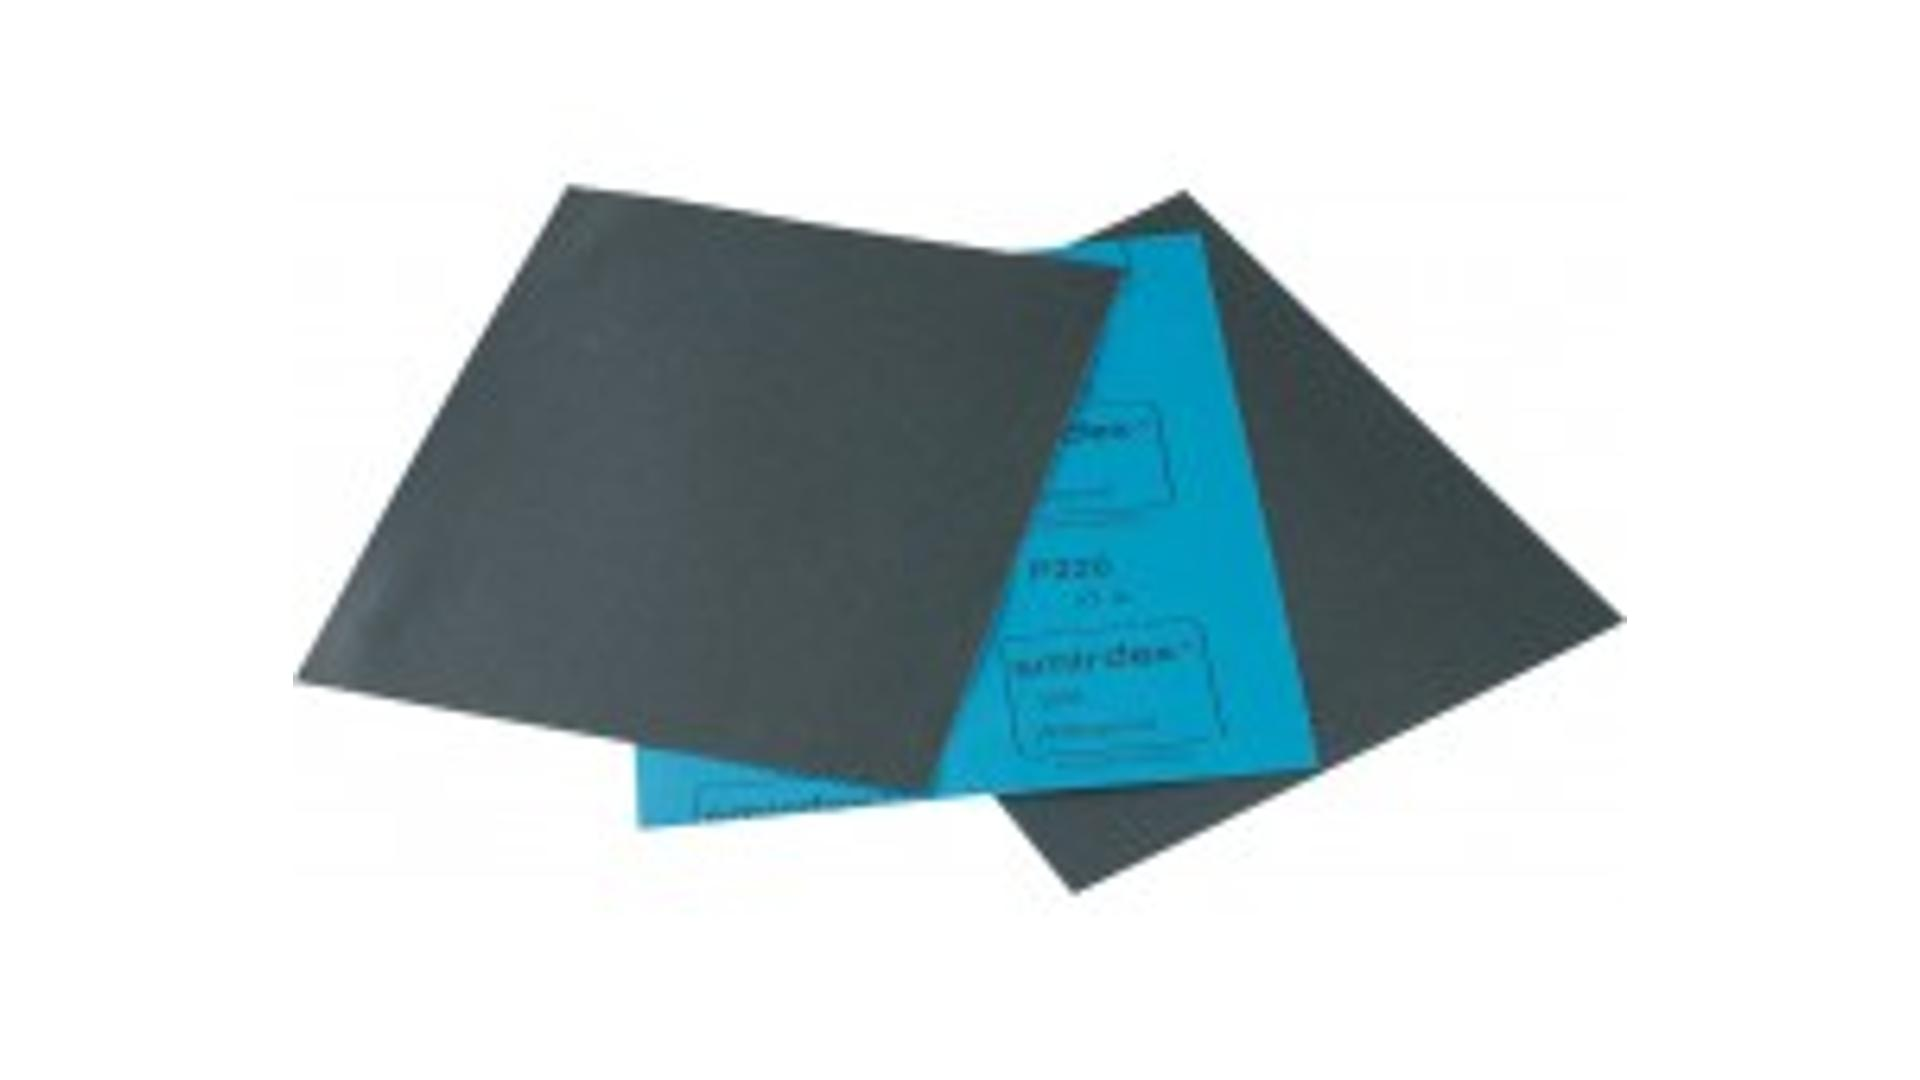 Smirdex 270 brusný papír pod vodu P2500